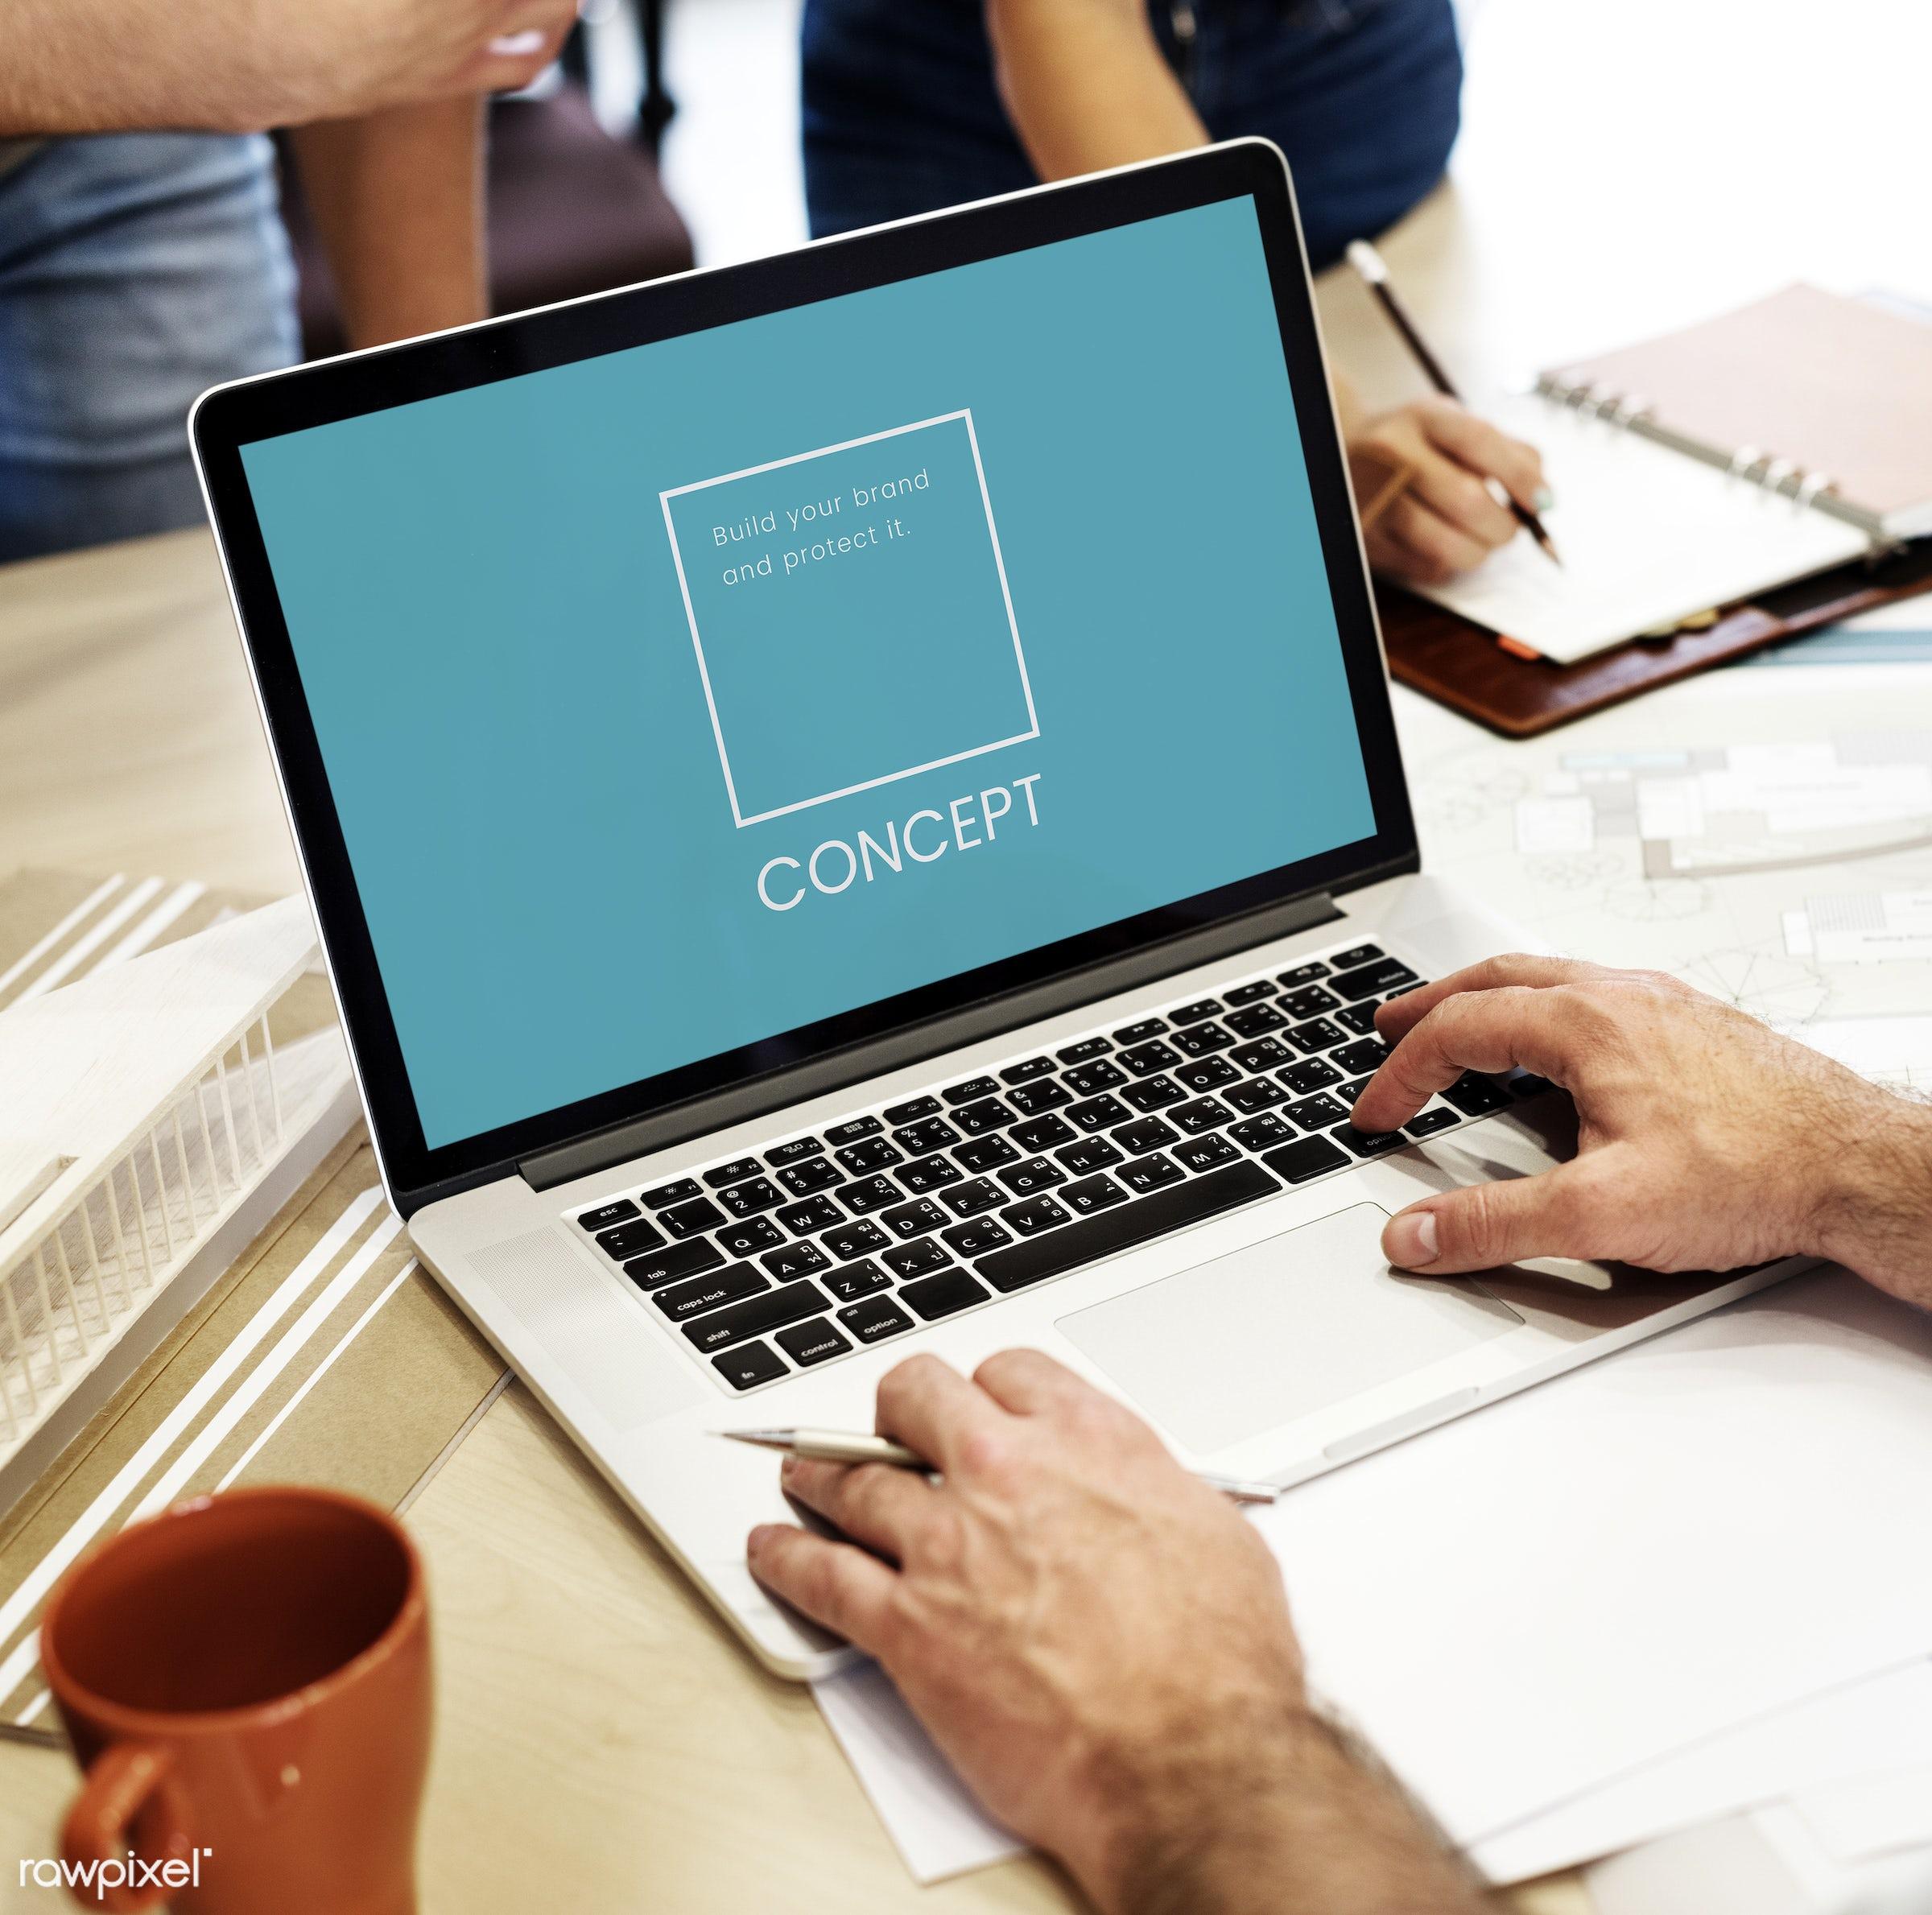 aim, architect, architecture, art, blueprint, brand, branding, coffee, coffee cup, concept, copyright, creative, cup, design...